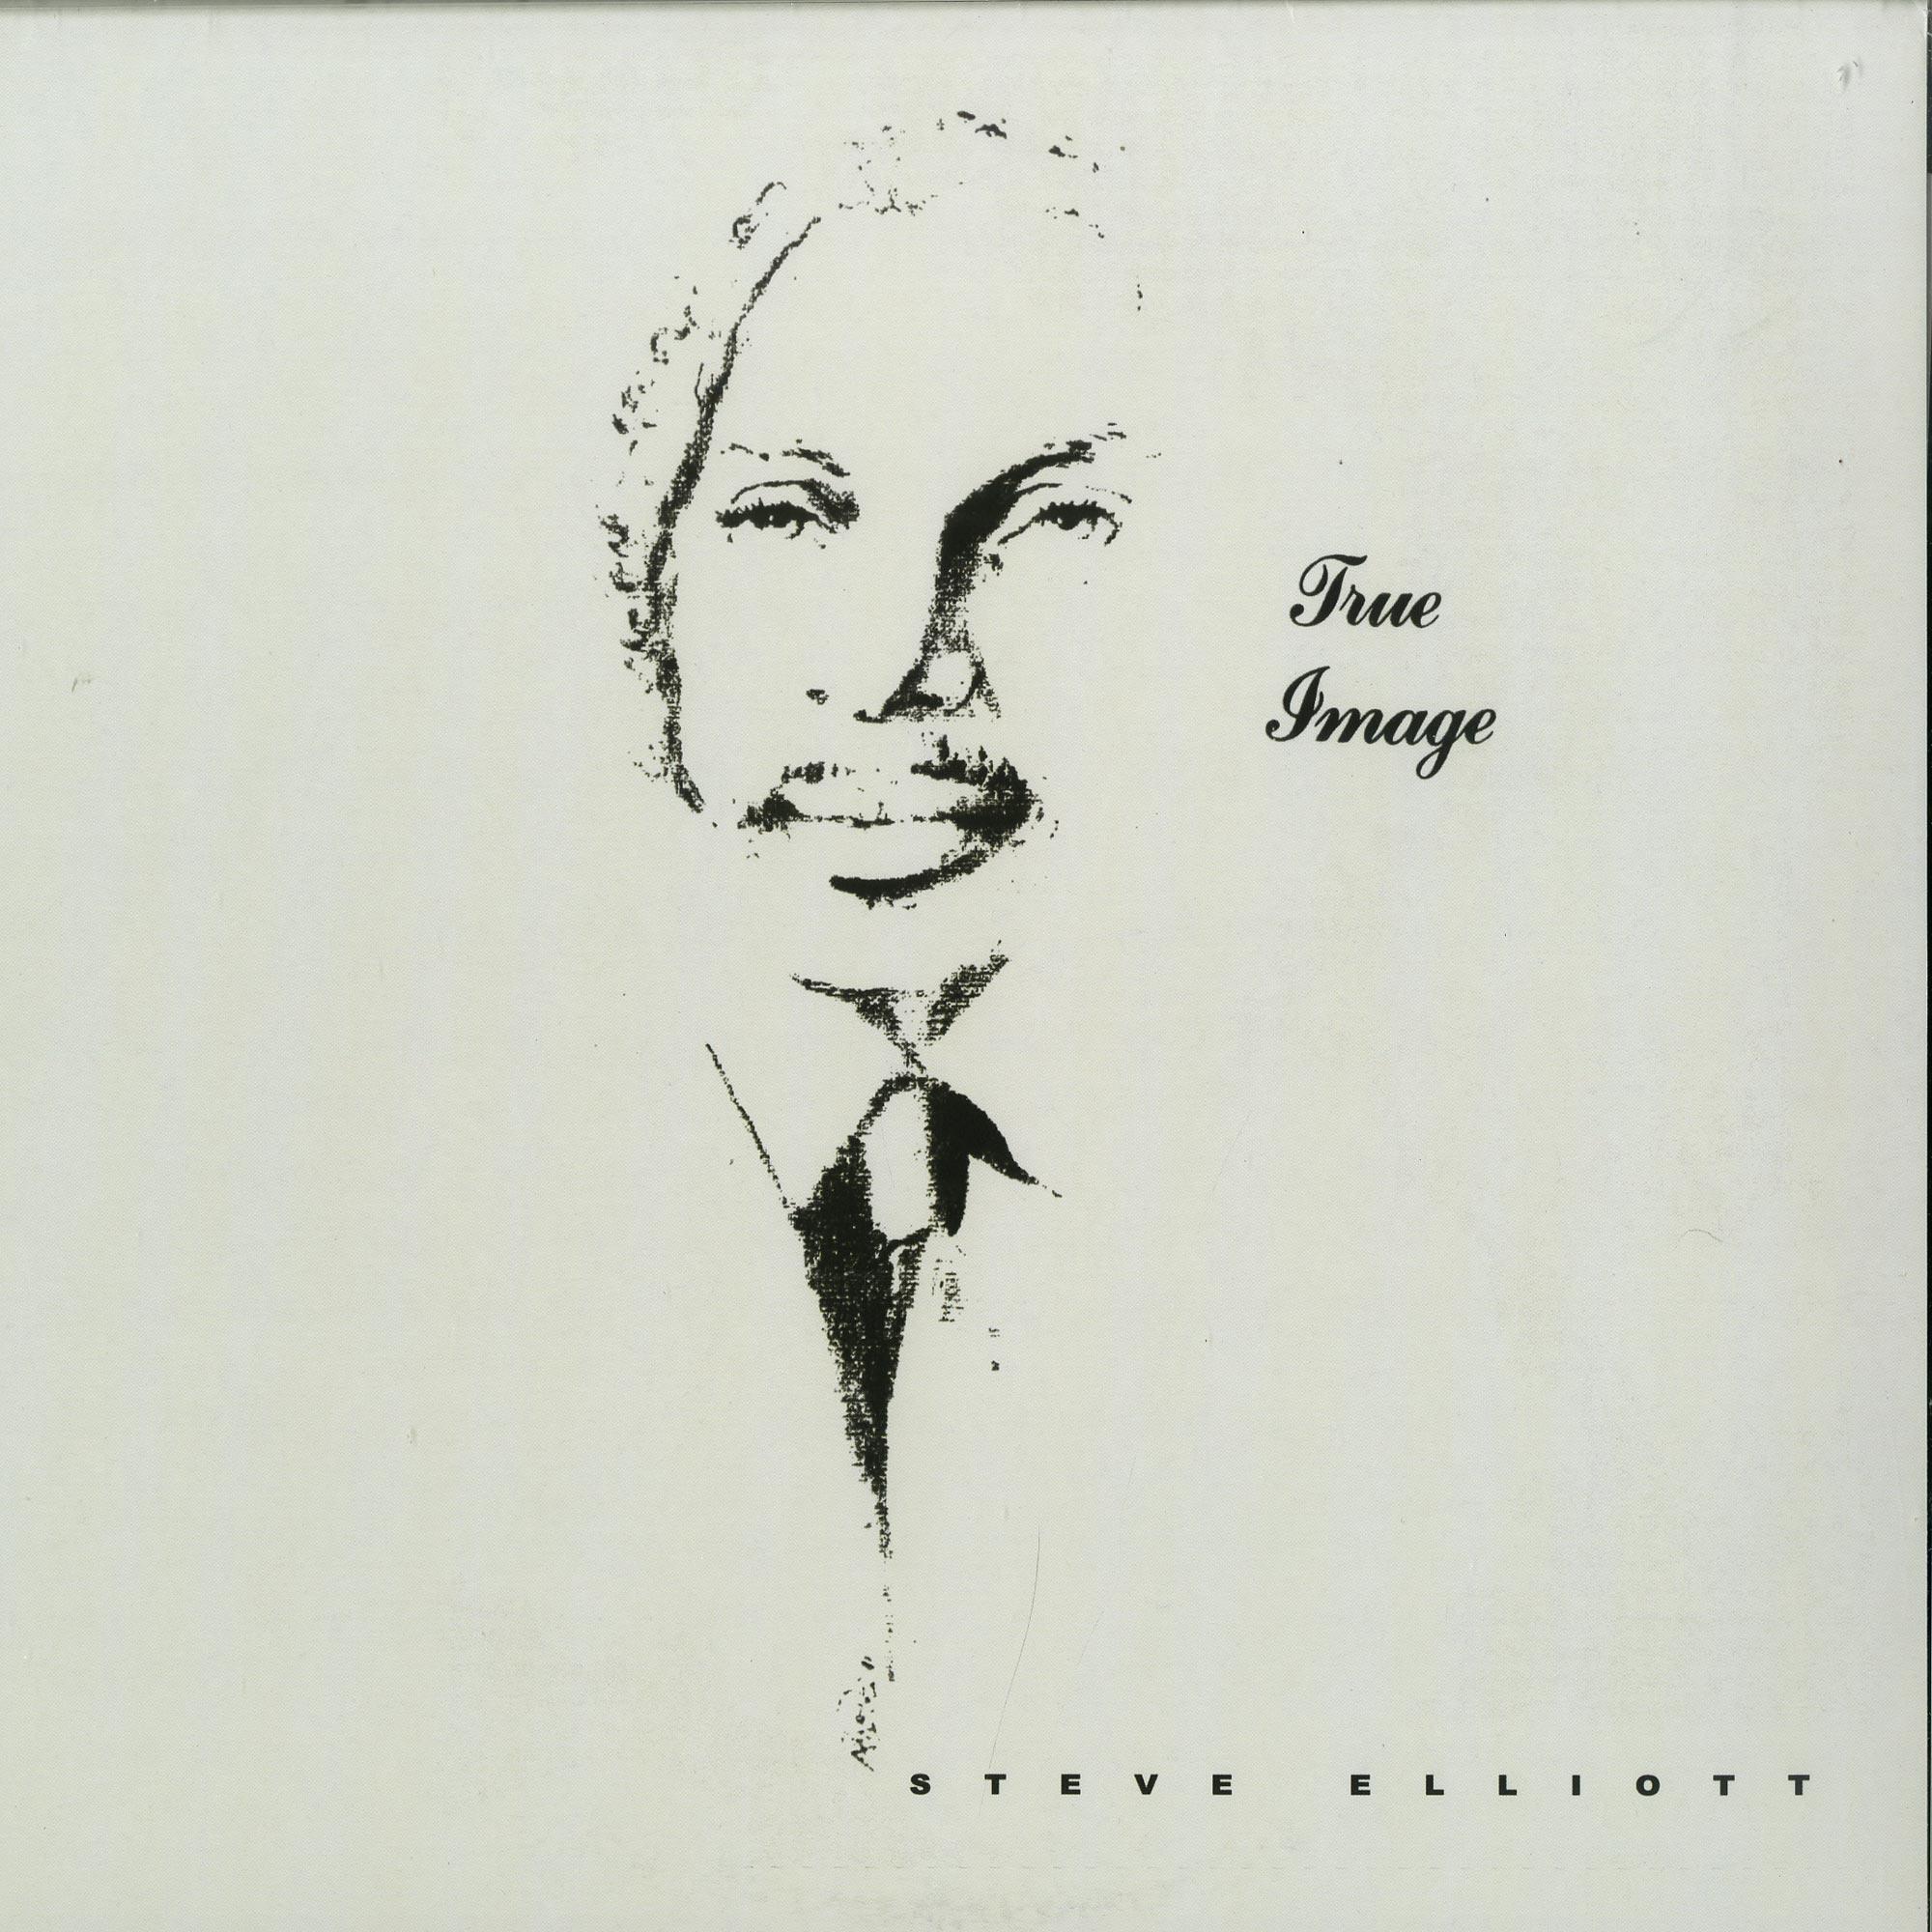 Steve Elliott - TRUE IMAGE LP